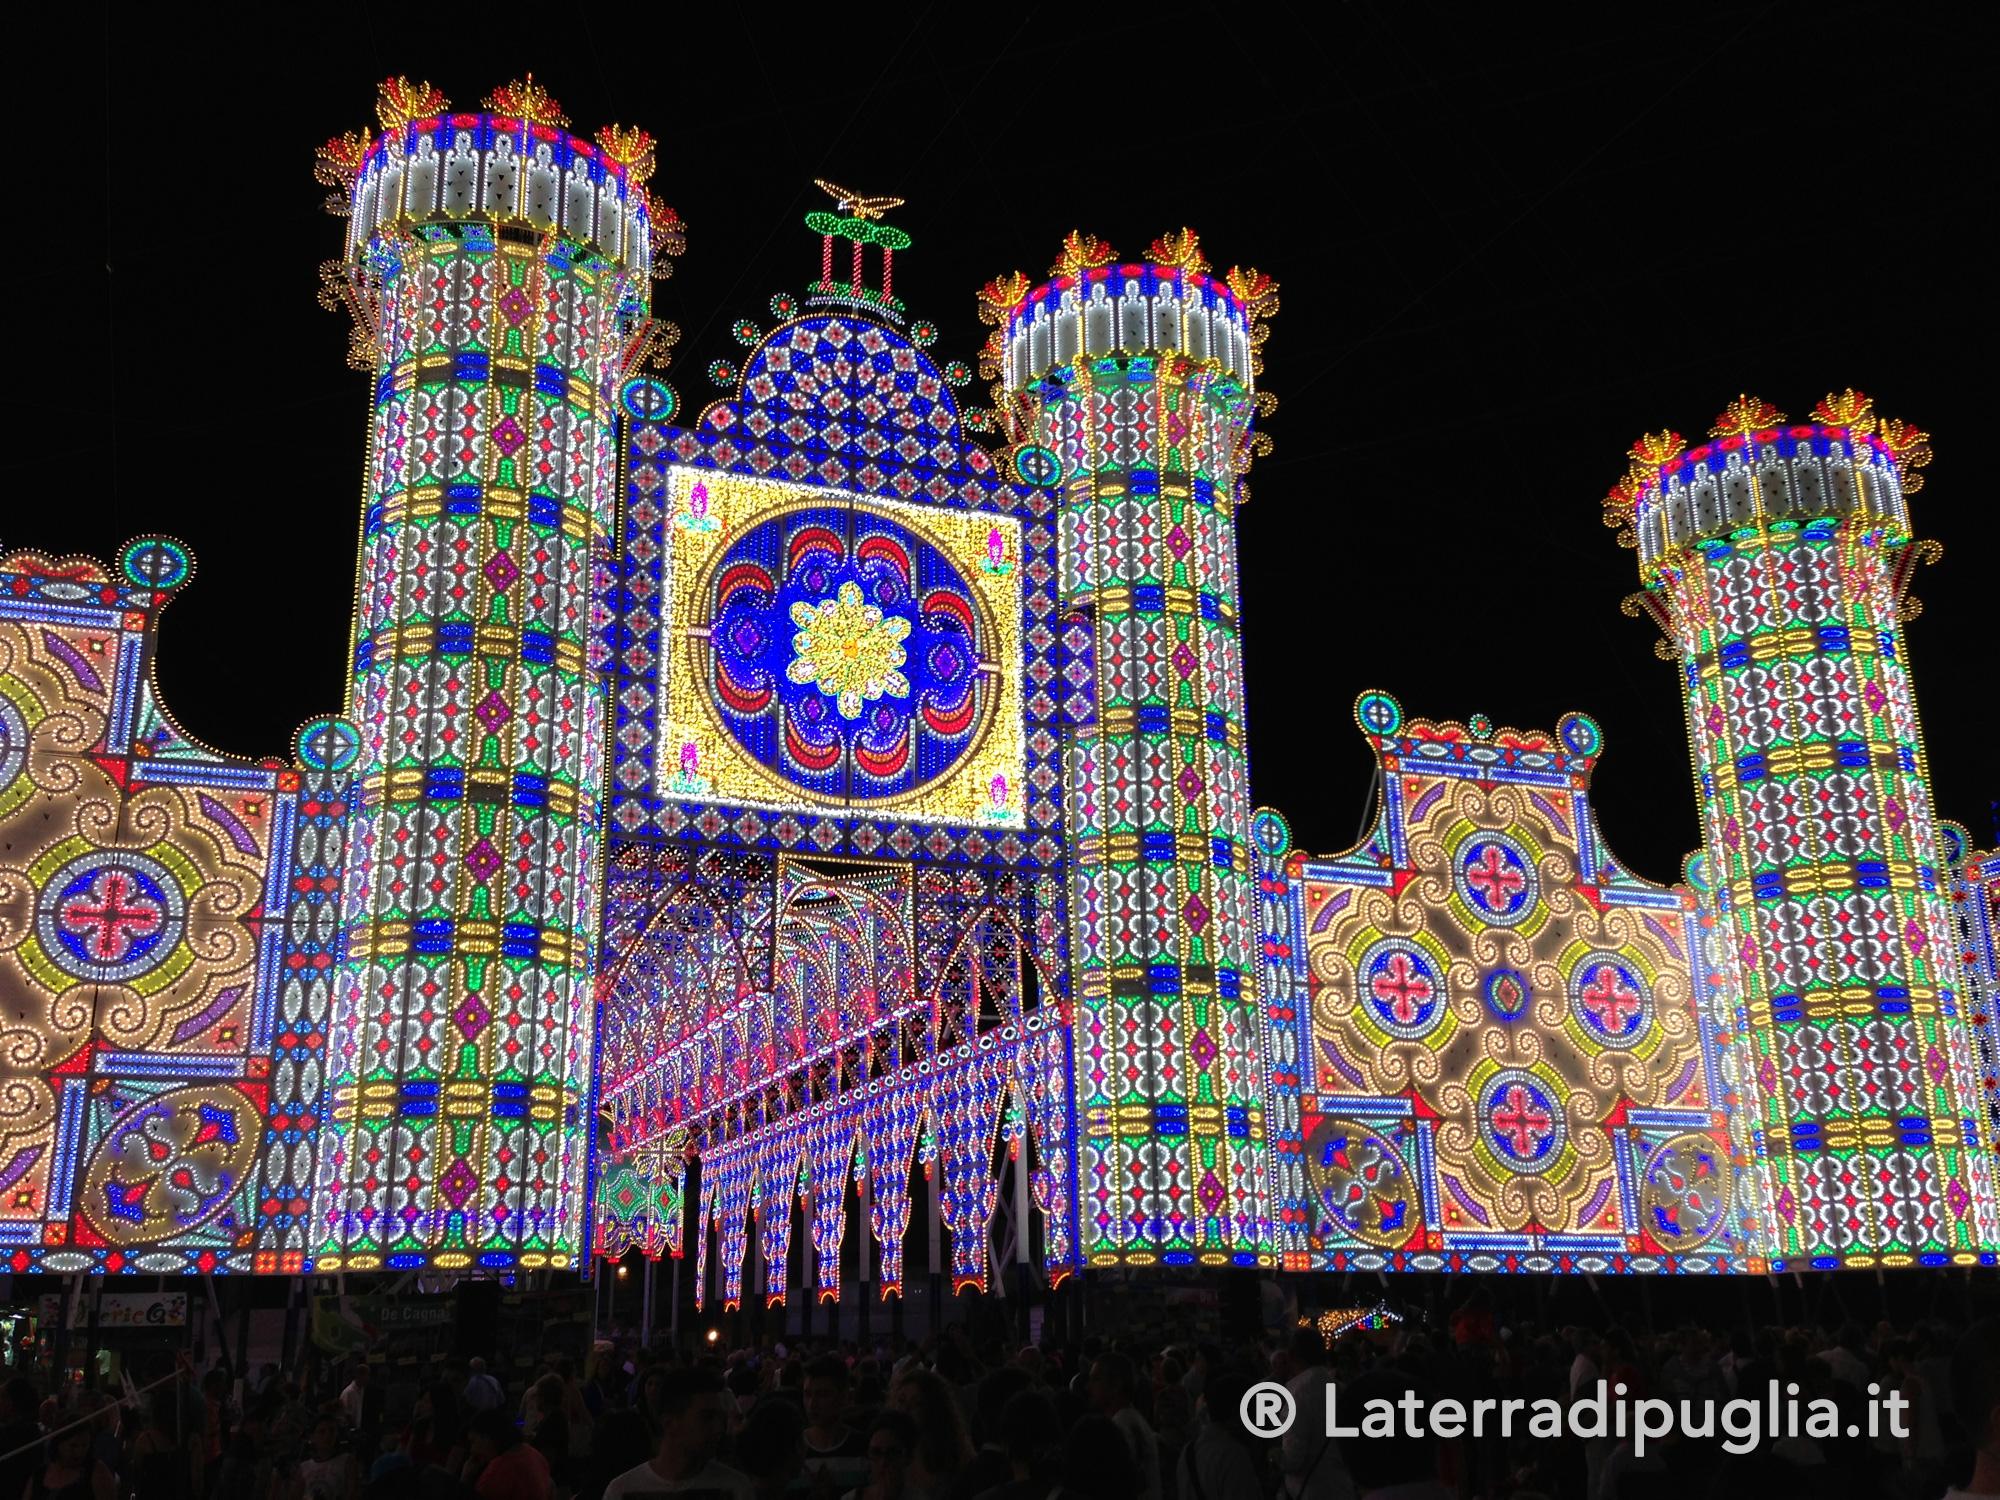 Luminarie per i festeggiamenti  in Puglia